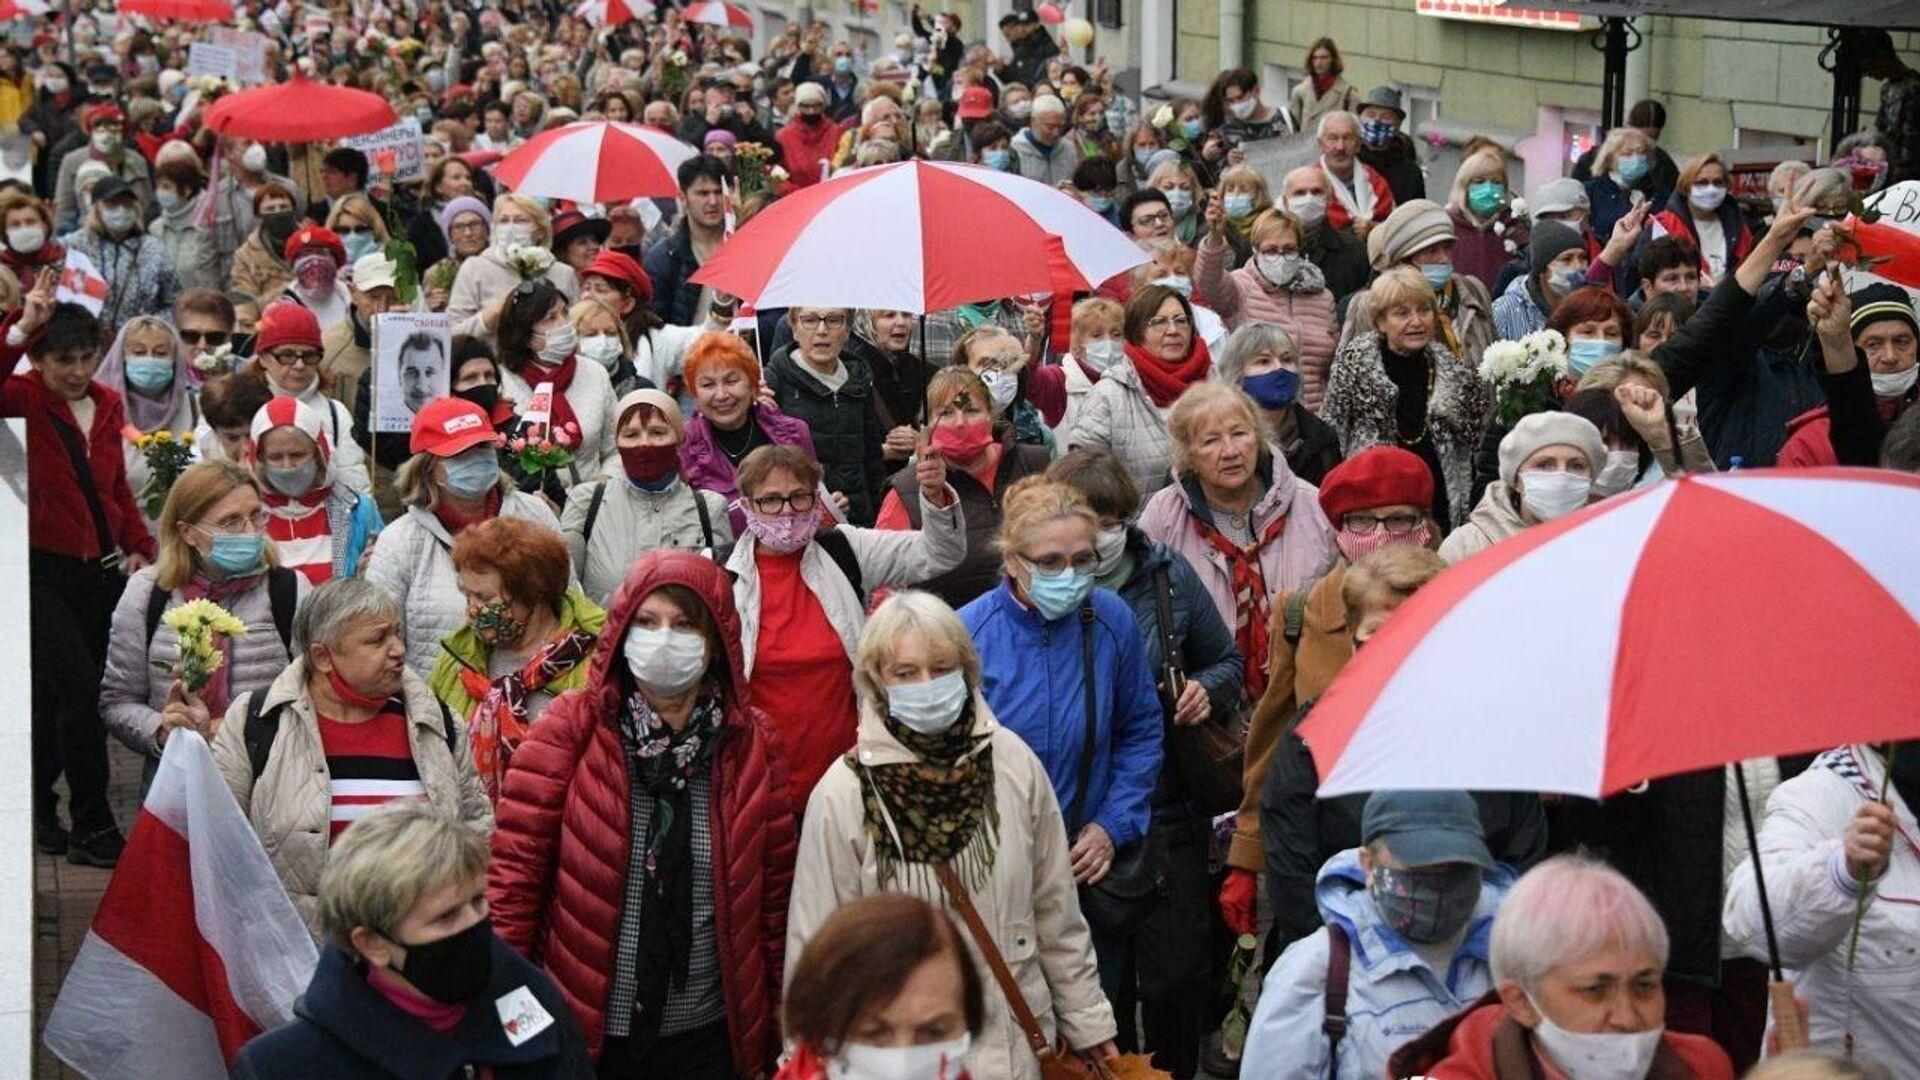 Колонна протестующих на проспекте Независимости в Минске - РИА Новости, 1920, 12.10.2020